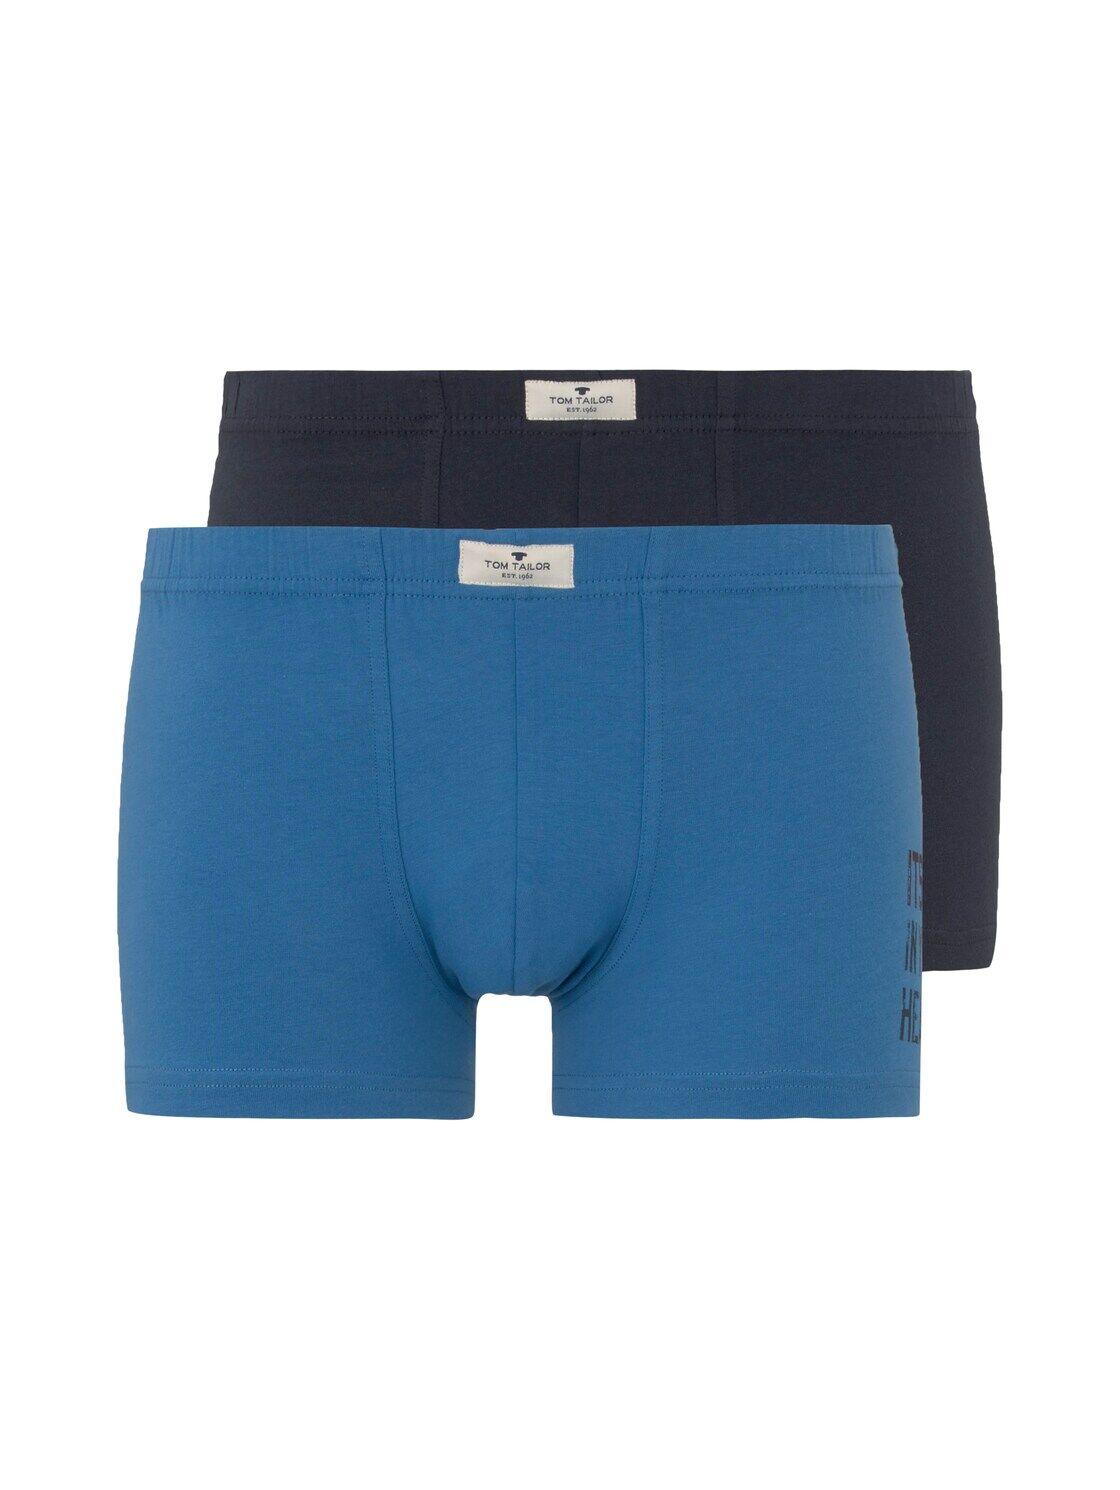 TOM TAILOR Herren Hip-Pants im Doppelpack, blau, Gr.S/4